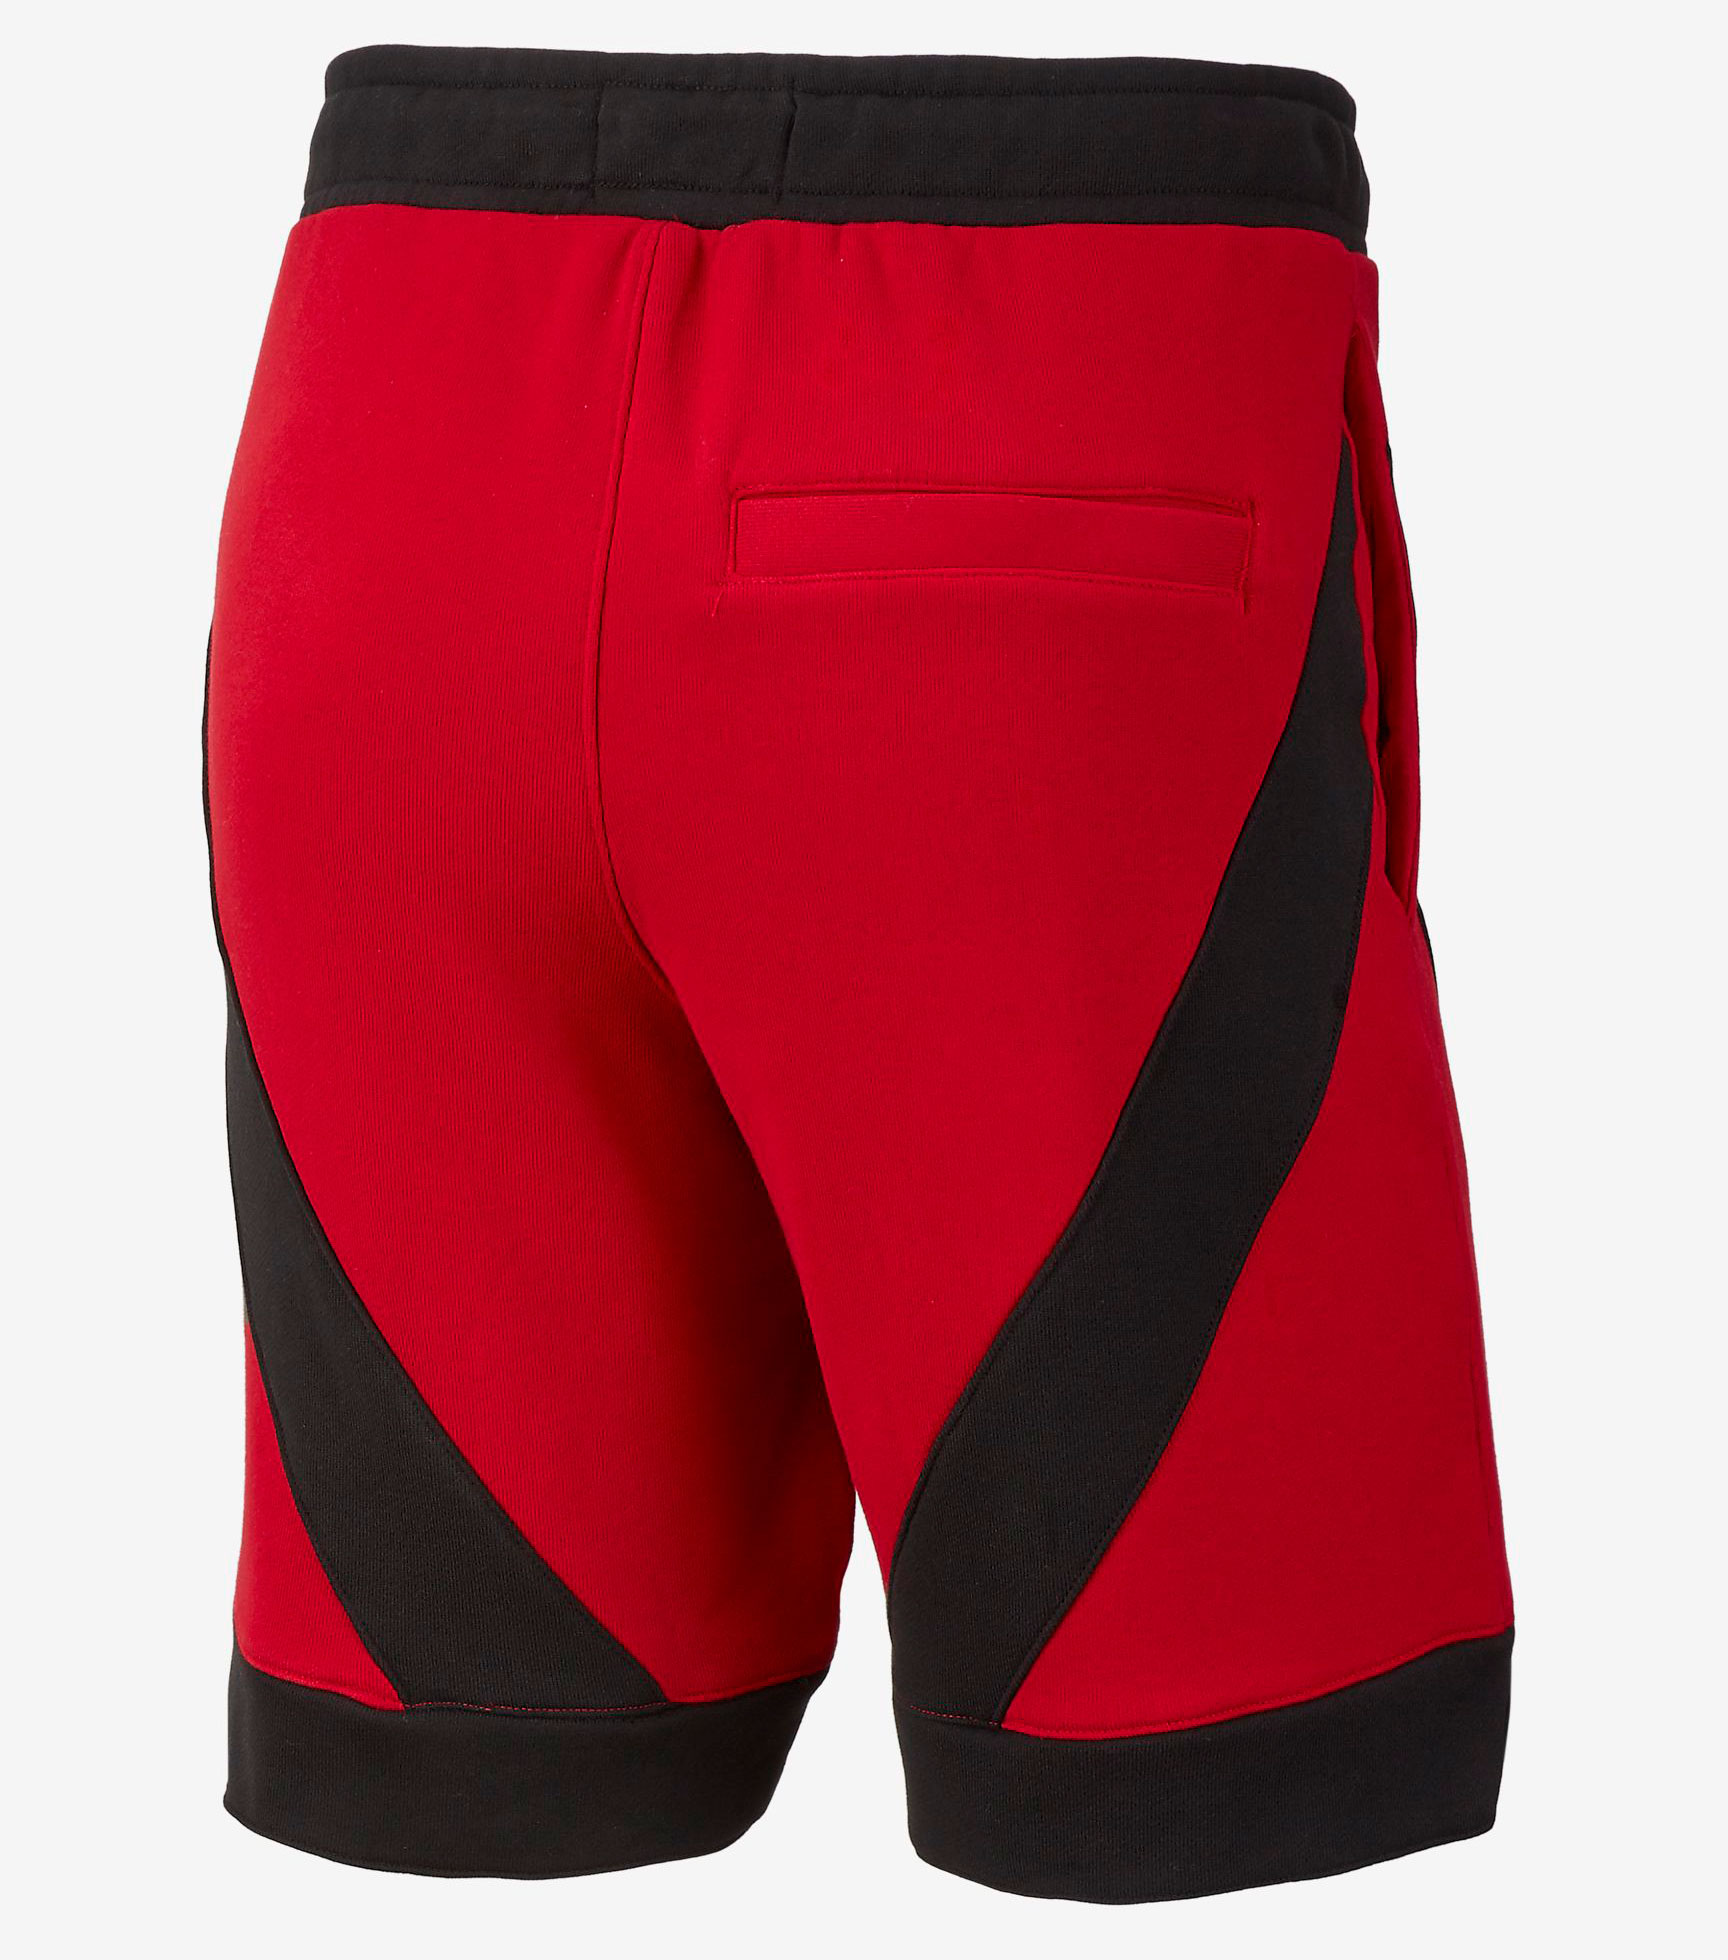 jordan-14-candy-cane-rip-hamilton-shorts-match-2